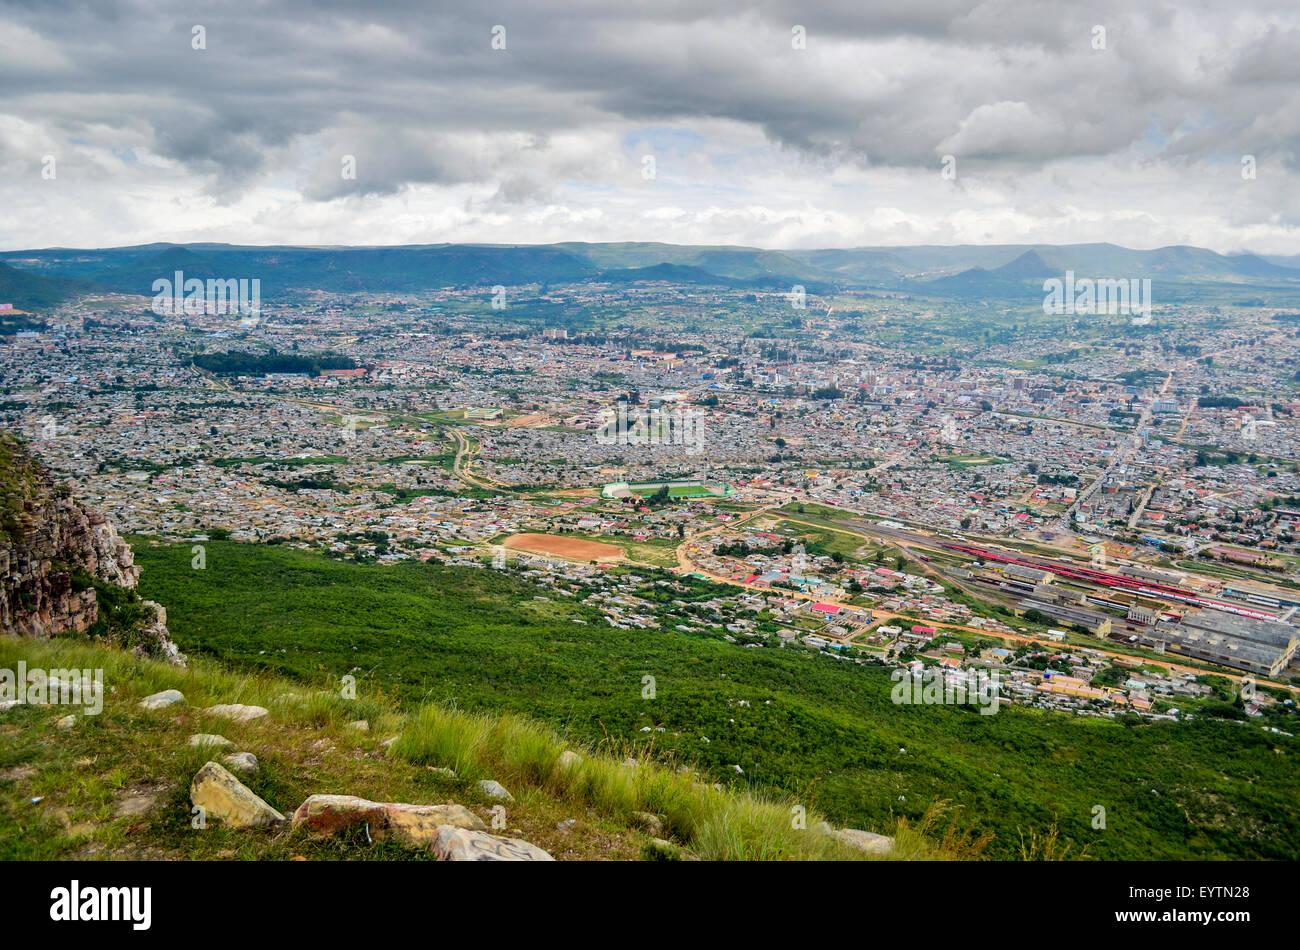 Aerial view of the city of Lubango, Angola Stock Photo